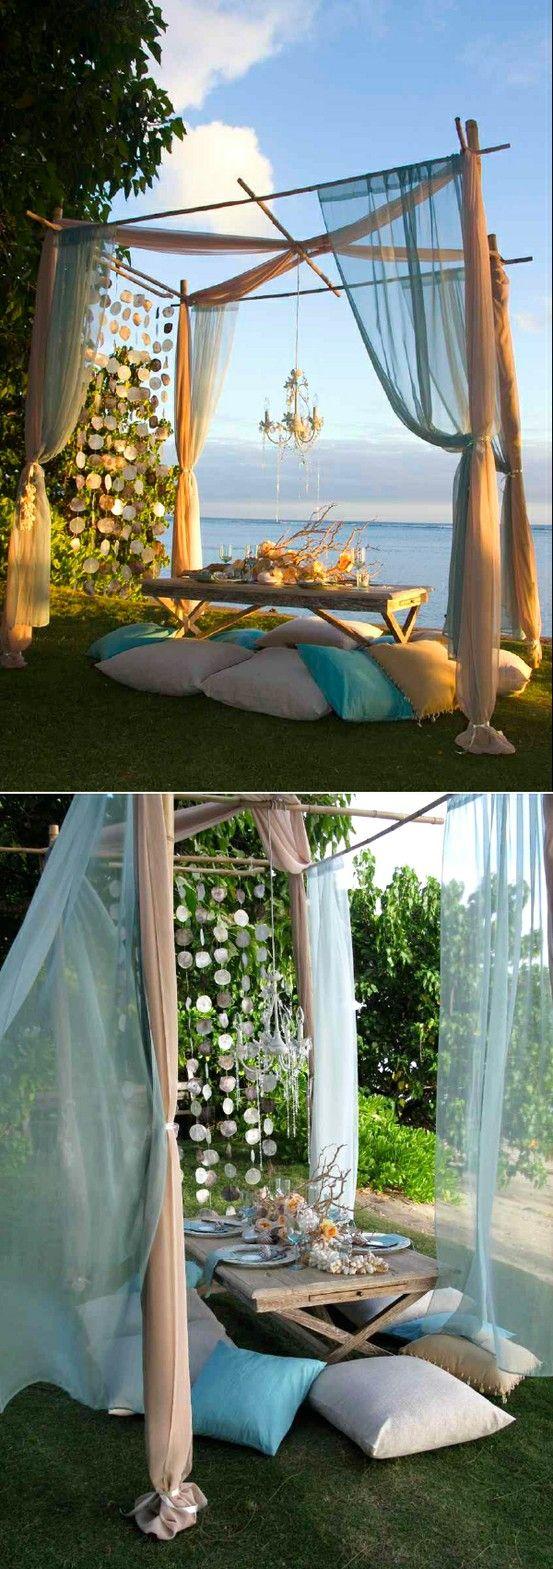 76 best backyard picnic party images on pinterest balcony